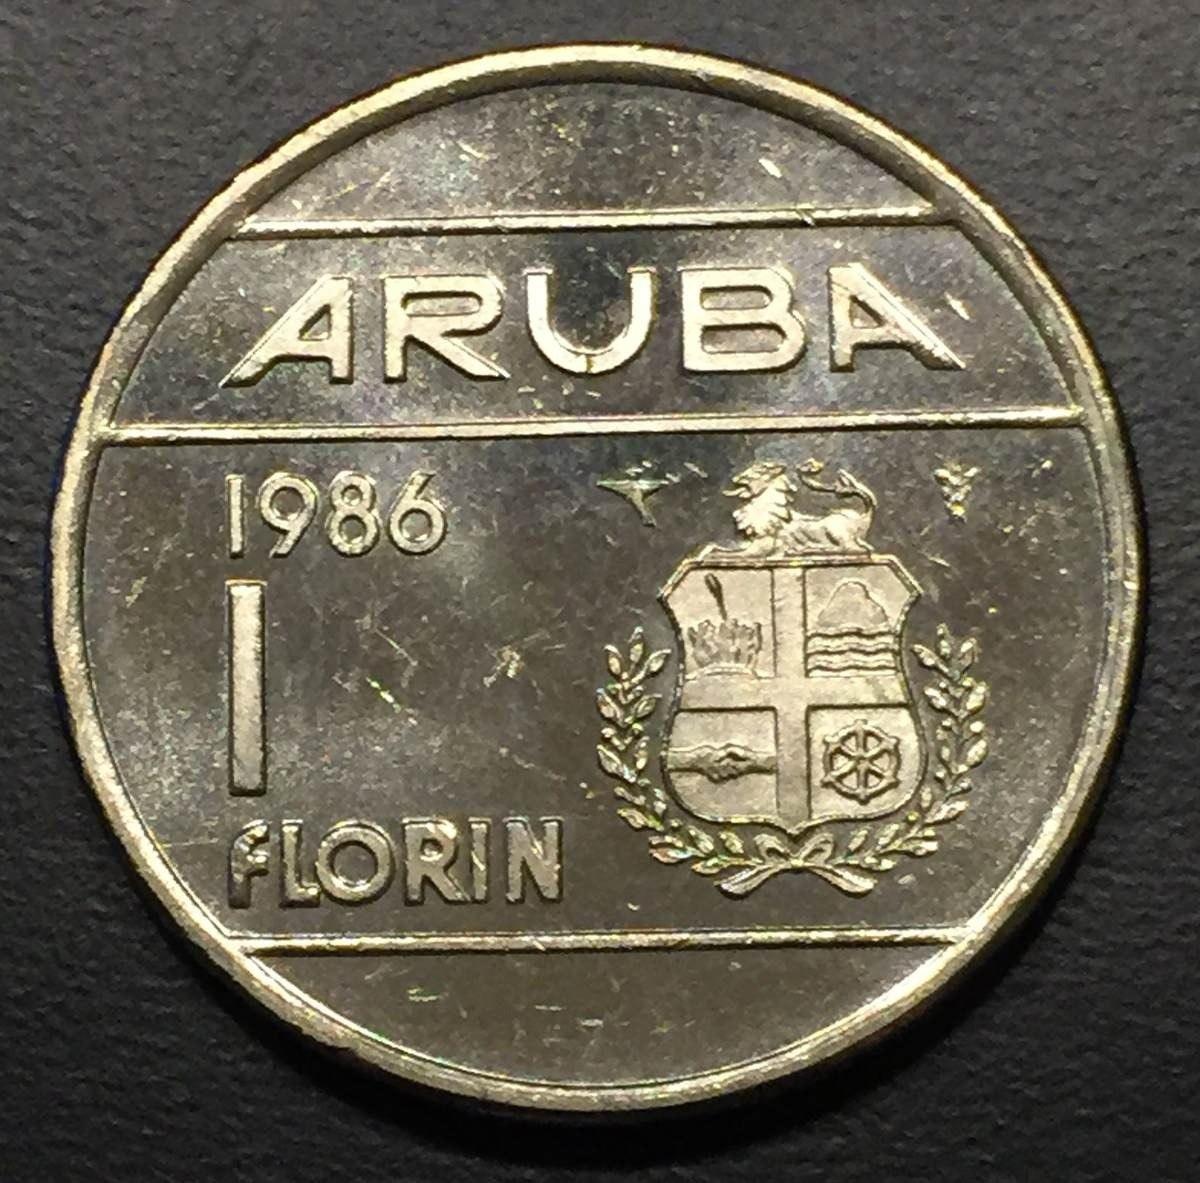 Monedas Antiguas De Aruba Cargando Zoom